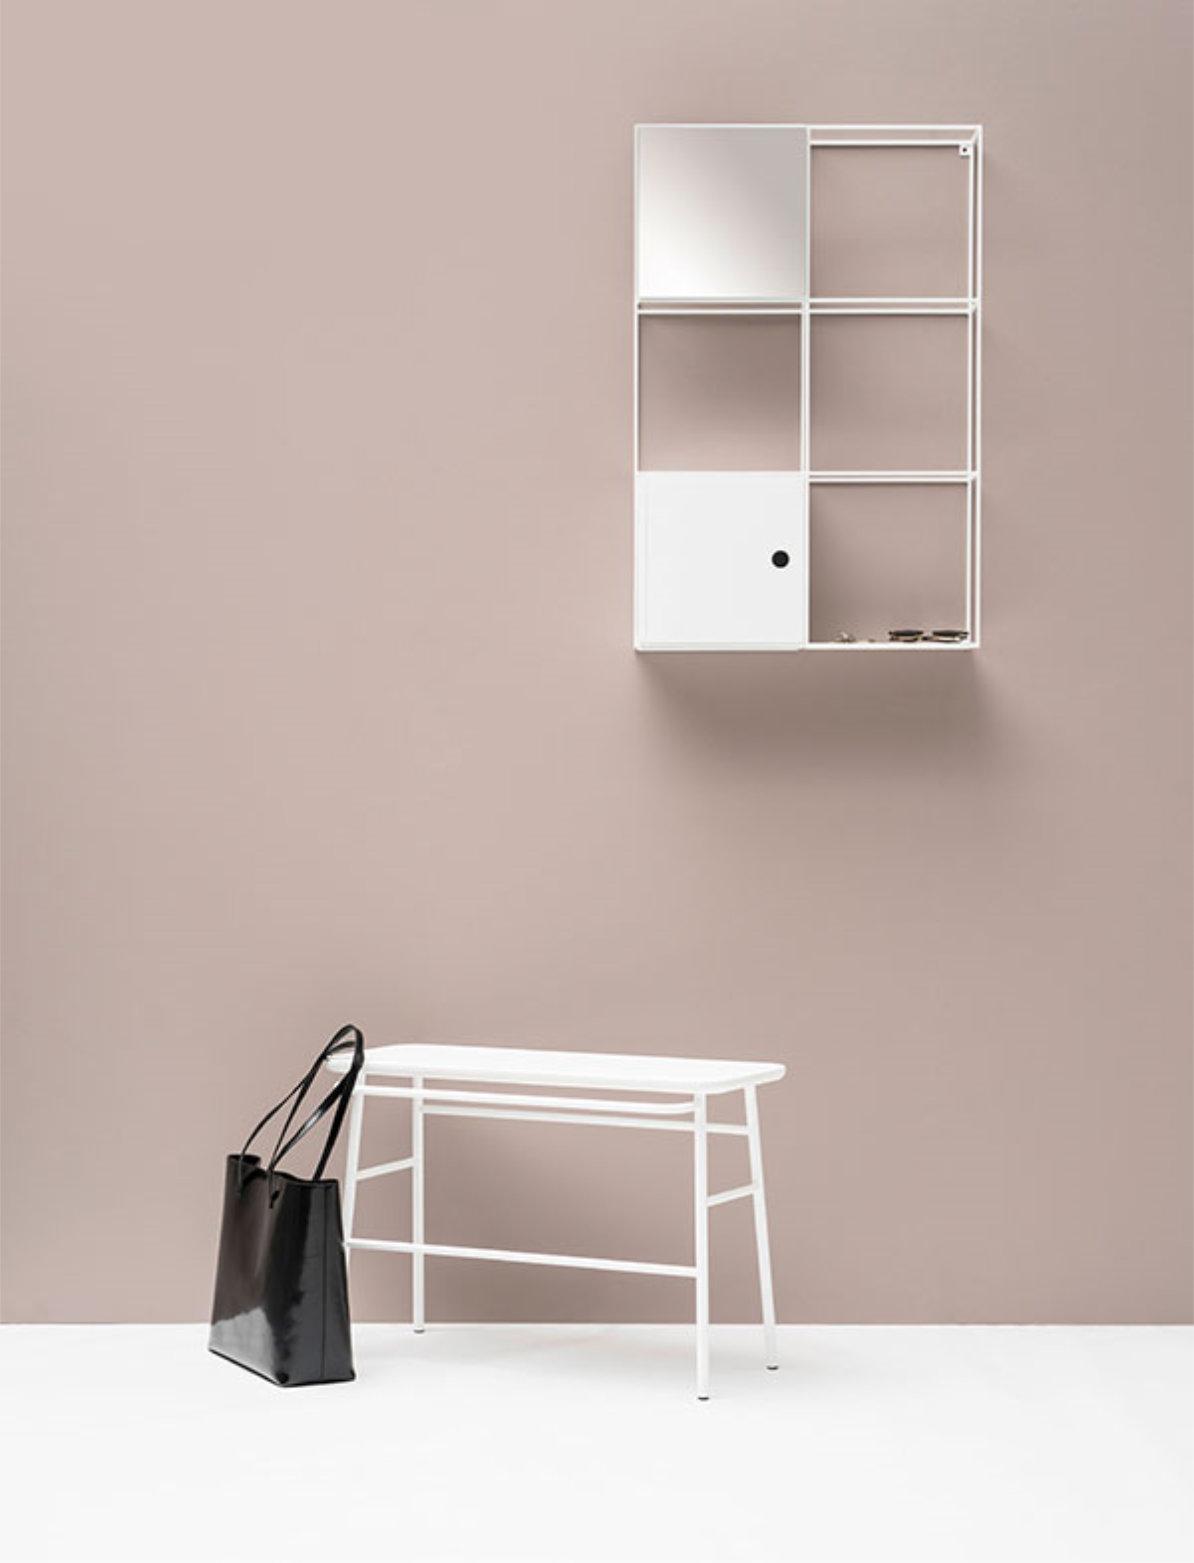 interiorlines_felt_white_norm_architects_6_2.jpg